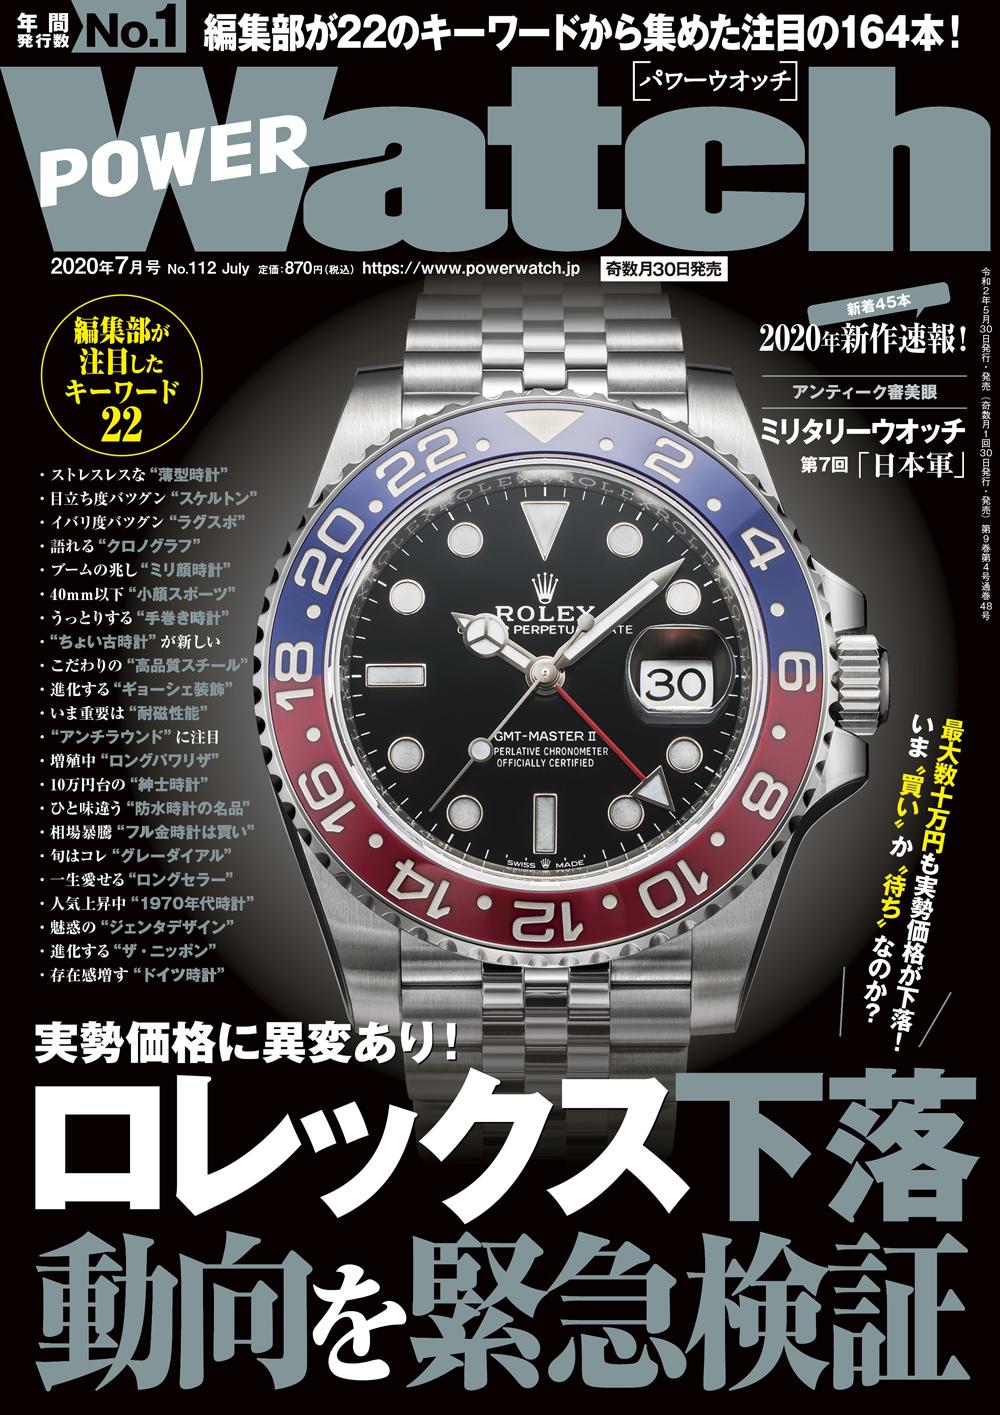 C's-Factory|書籍|PowerWATCH 7月号